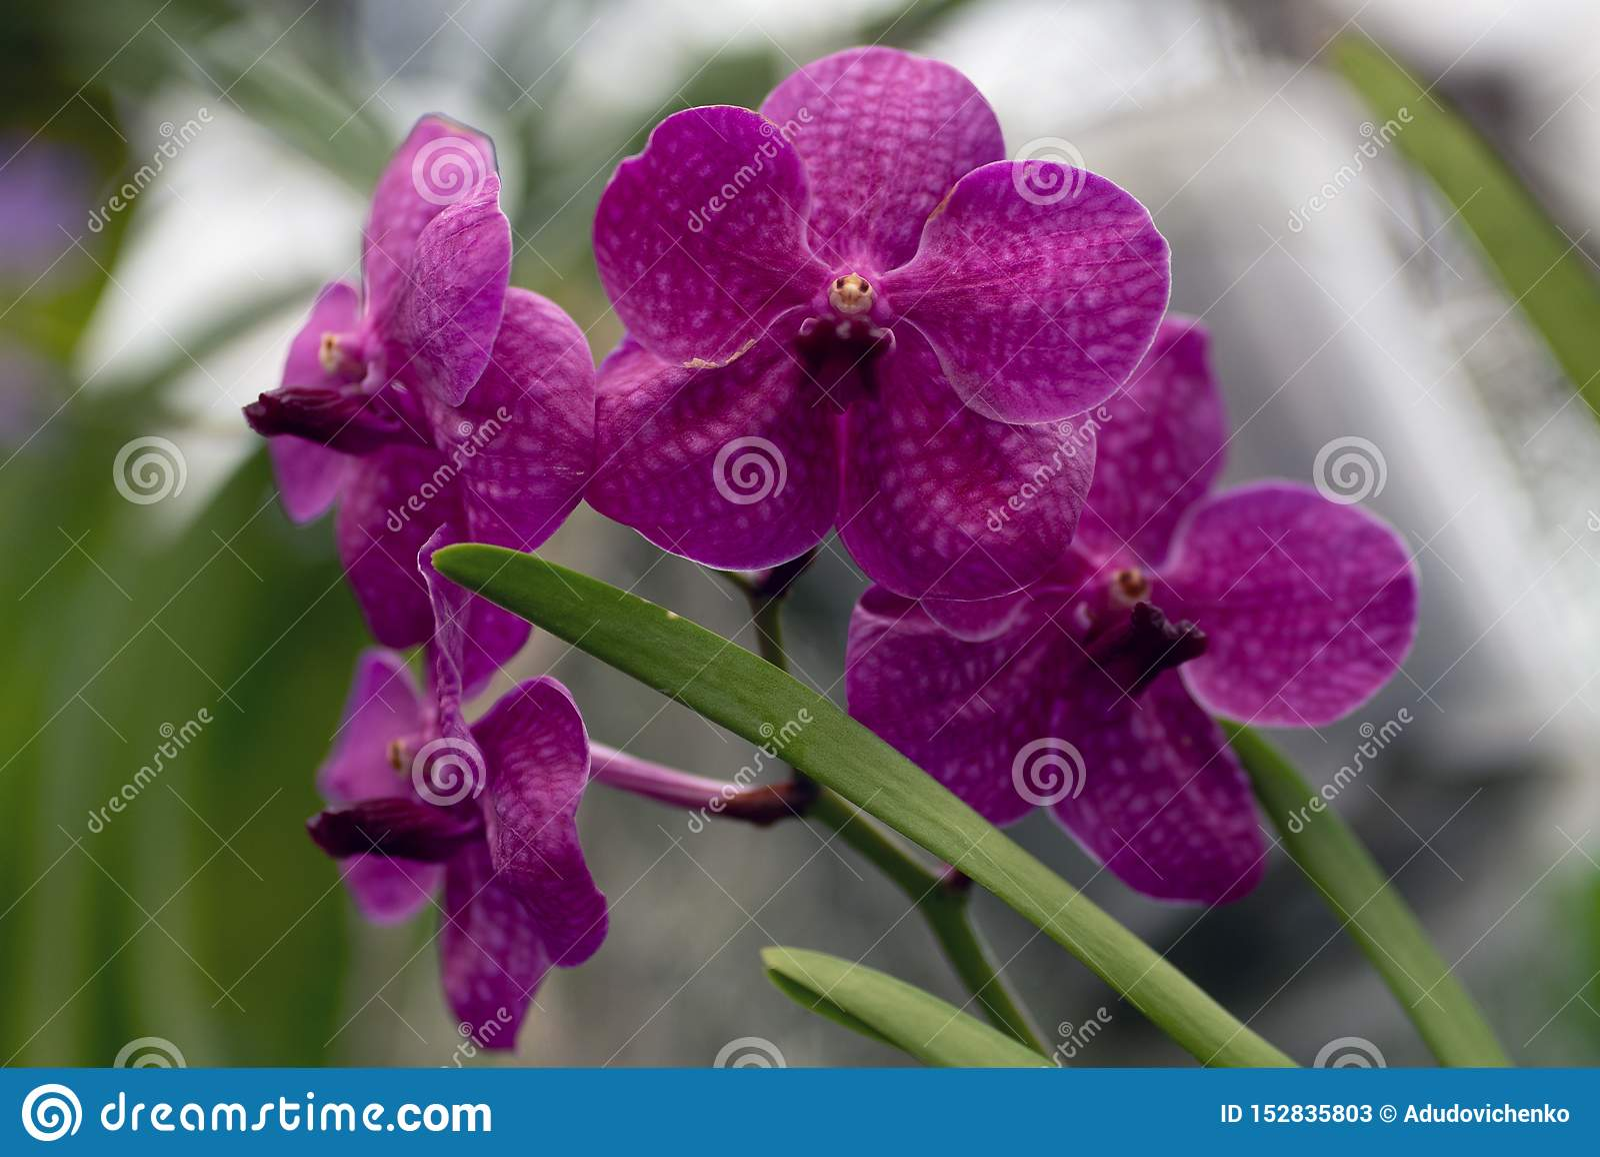 Rosa phalaenopsis, rosa orkidéslut upp i mjuk fokus